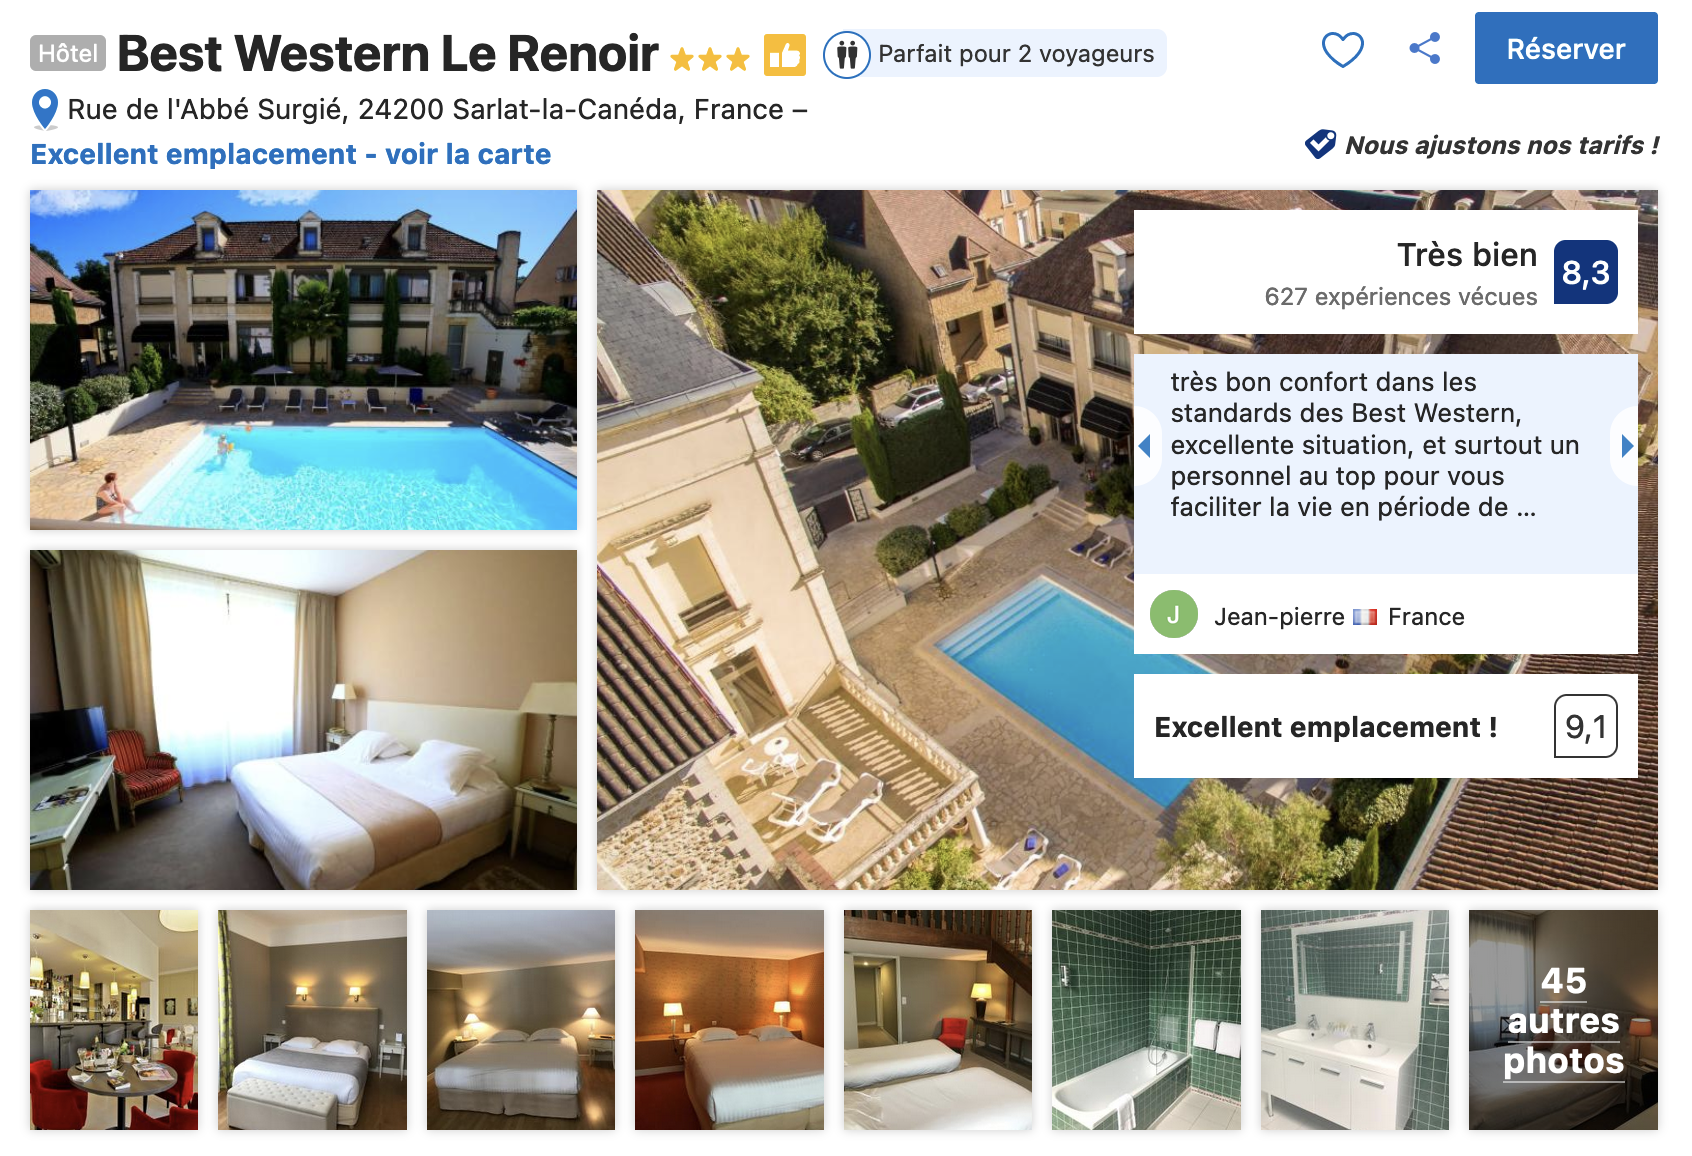 hotel-trois-etoiles-sarlat-bon-rapport-qualite-prix